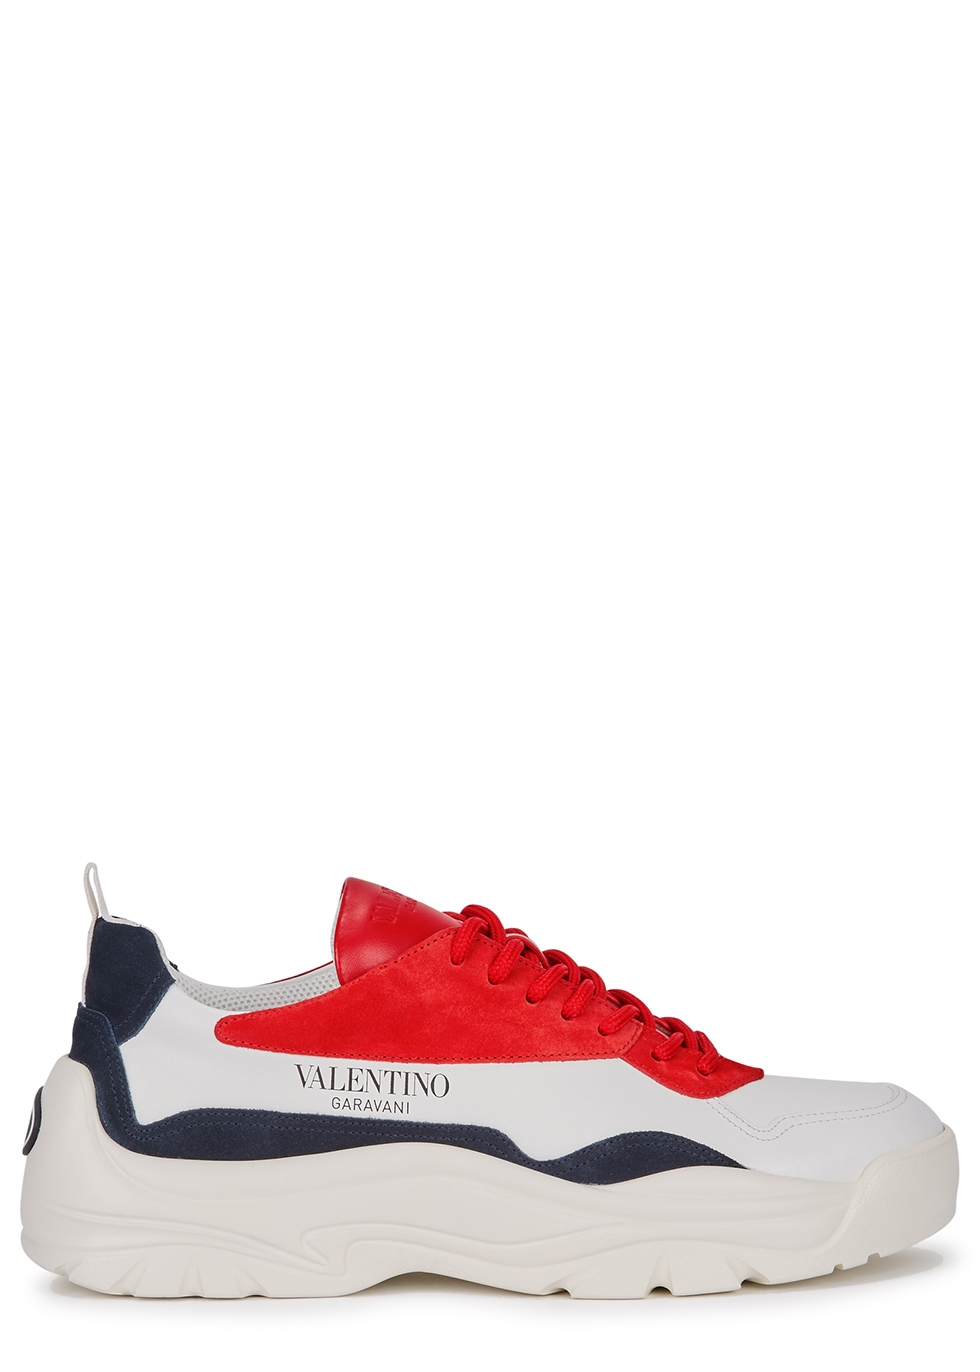 Shoes TrainersSneakersamp; Nichols Designer Sports Men's Harvey 6g7yYbf